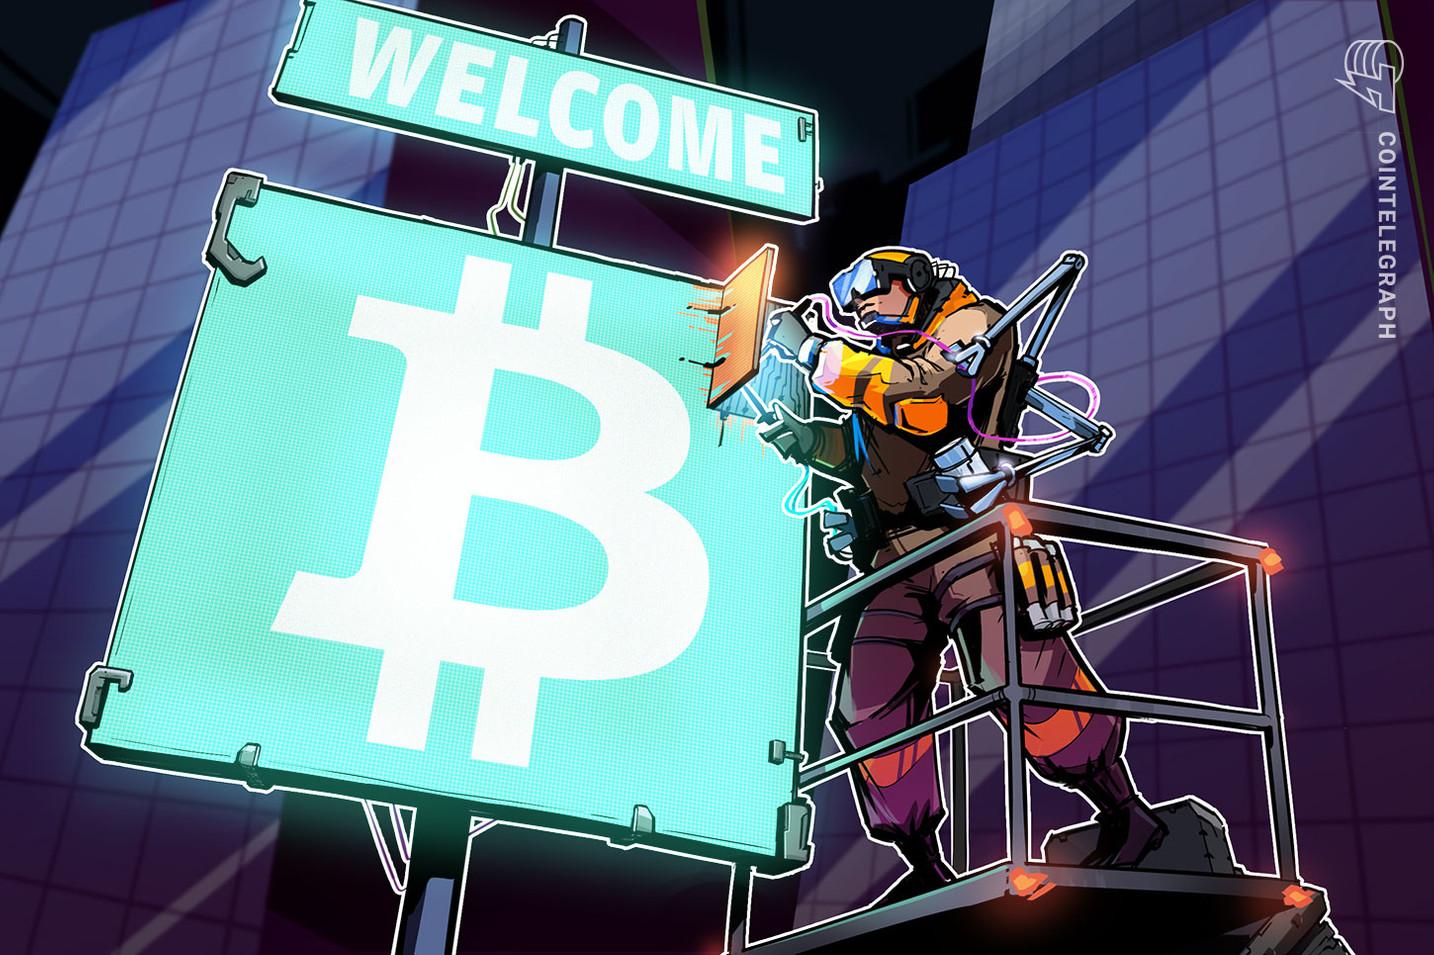 Bitcoin-related altcoins surge as BTC ETF rumors spread across the sector